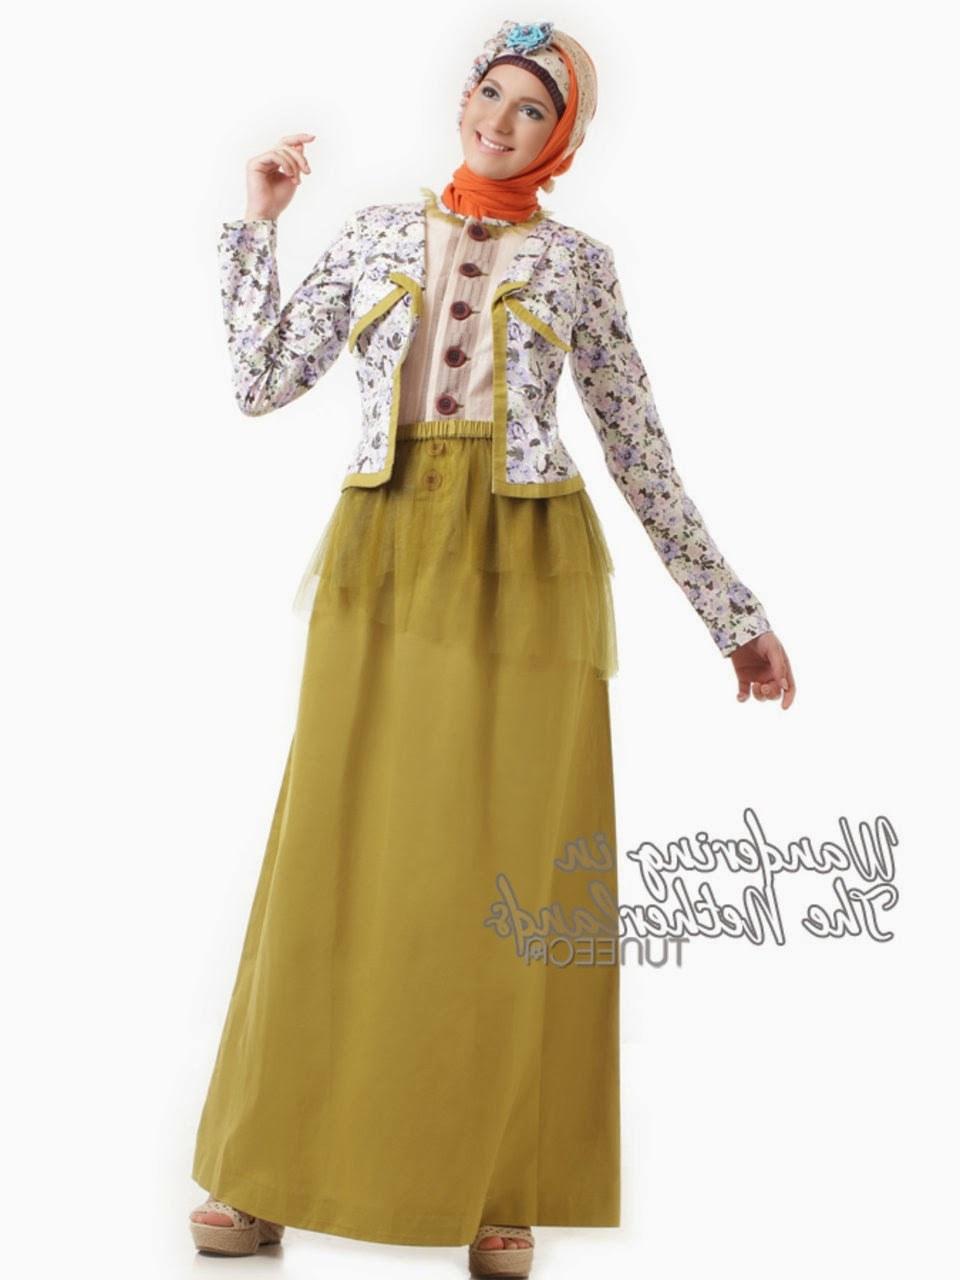 Ide Foto Baju Lebaran Terbaru E6d5 12 Contoh Model Gamis Muslim Lebaran Terbaru Kumpulan